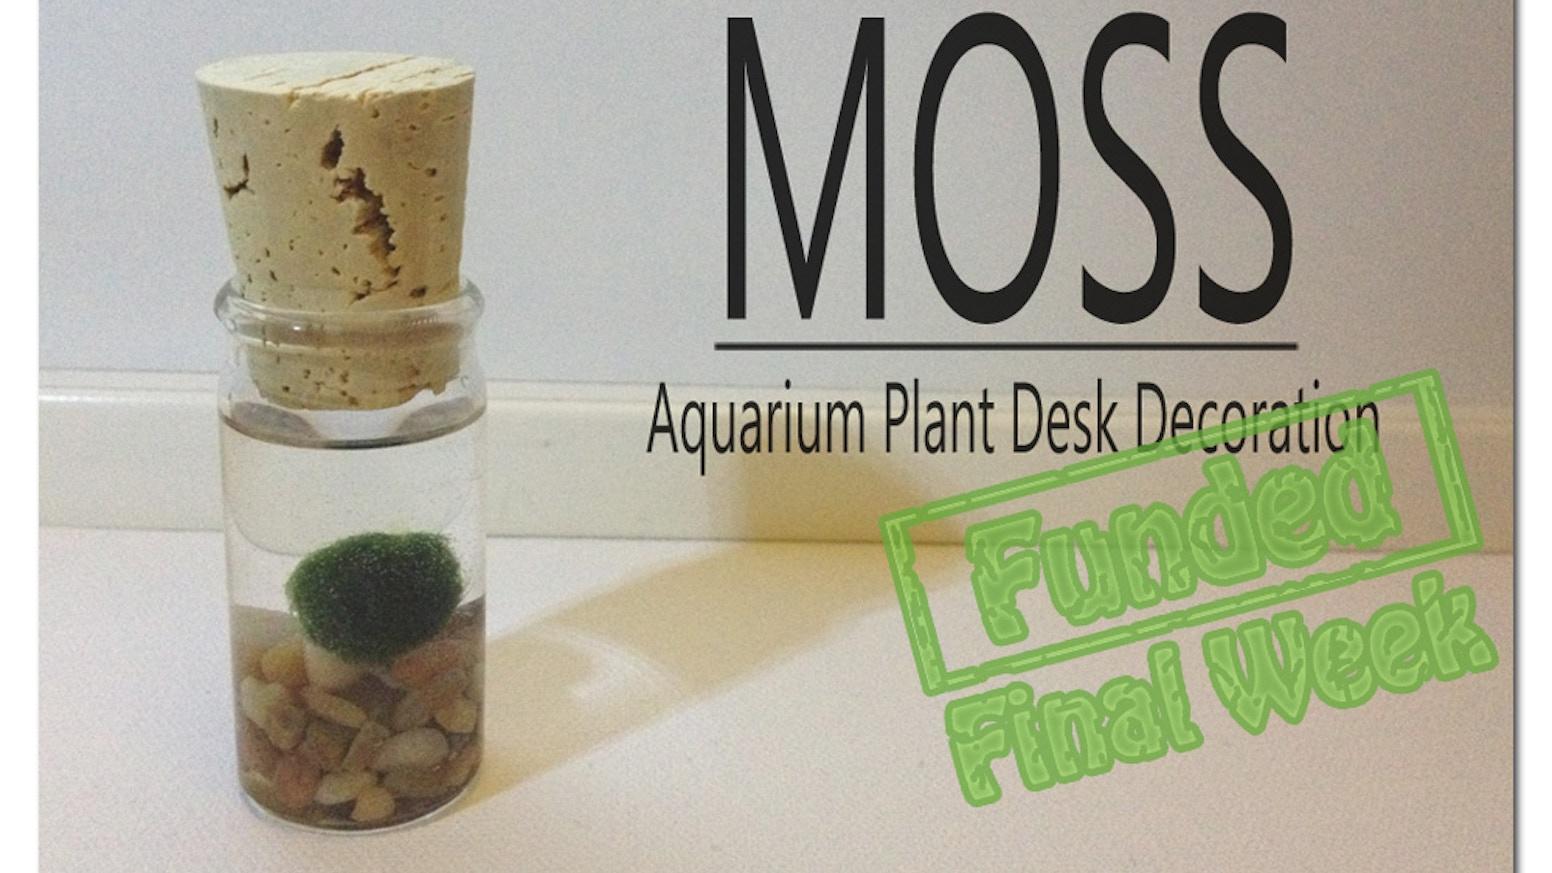 Moss aquarium plant desk decoration by ka ho kickstarter for A link text decoration